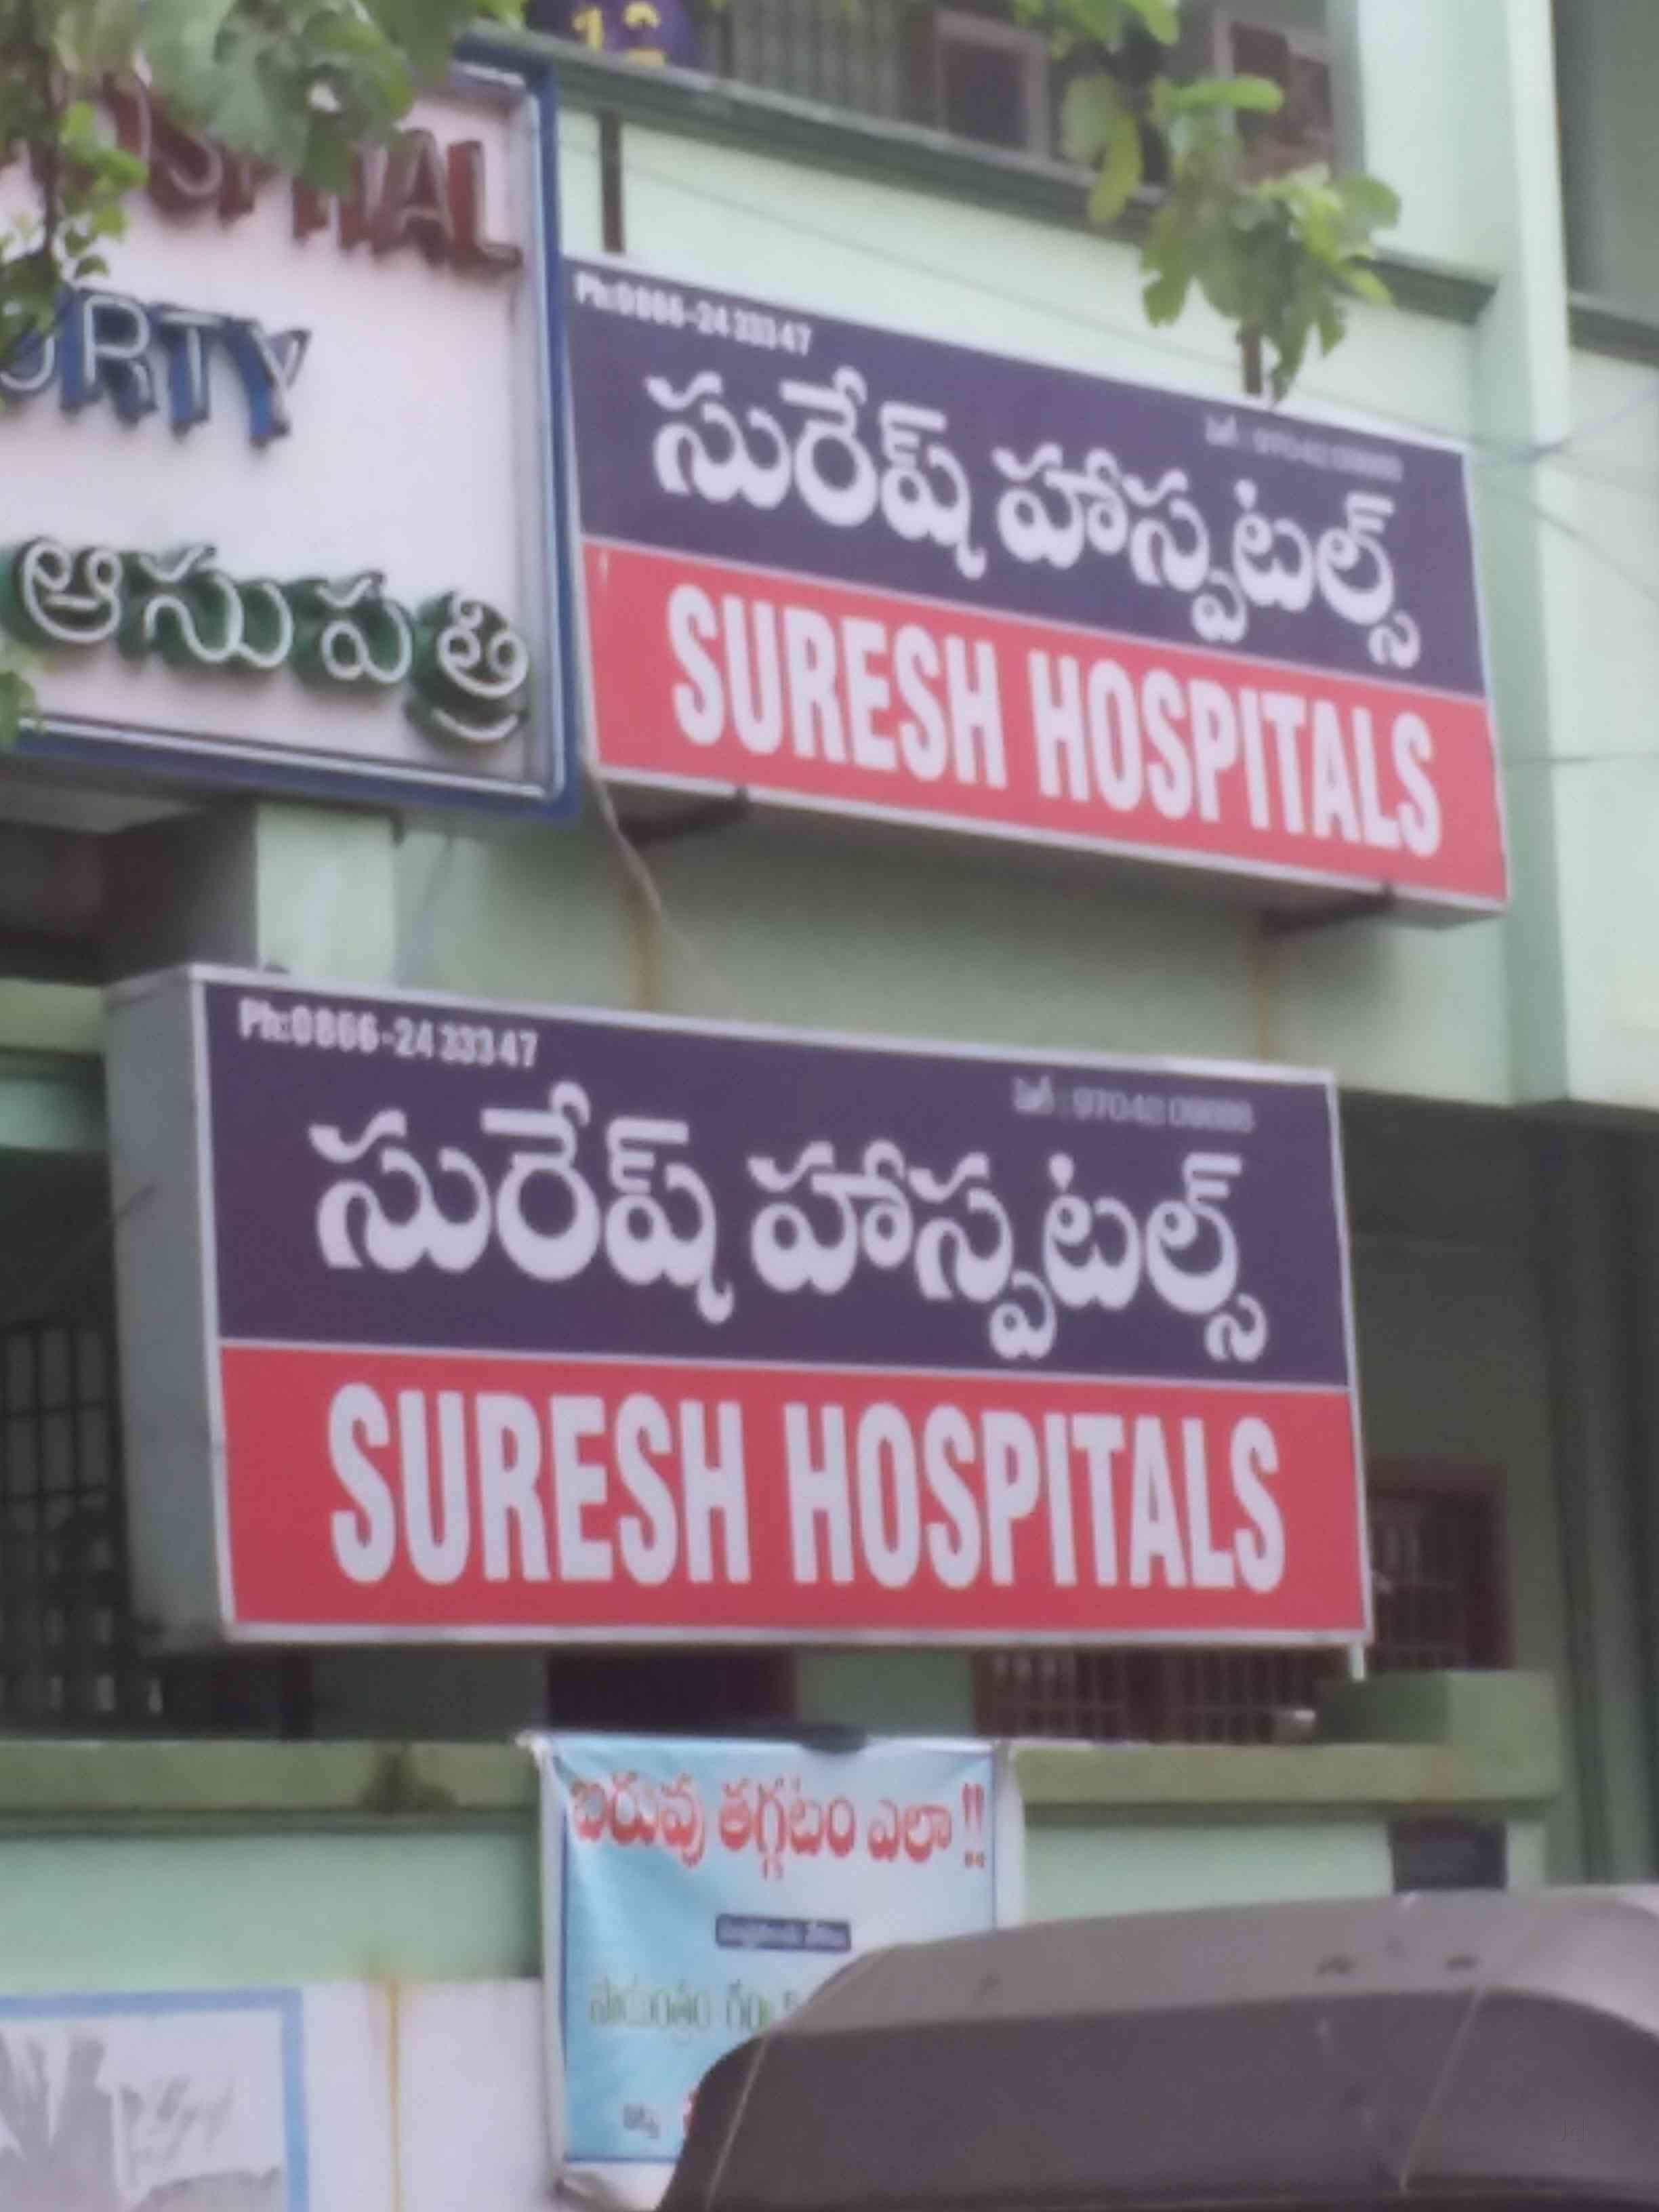 Suresh Hospitals - Suryaraopet - Vijayawada Image